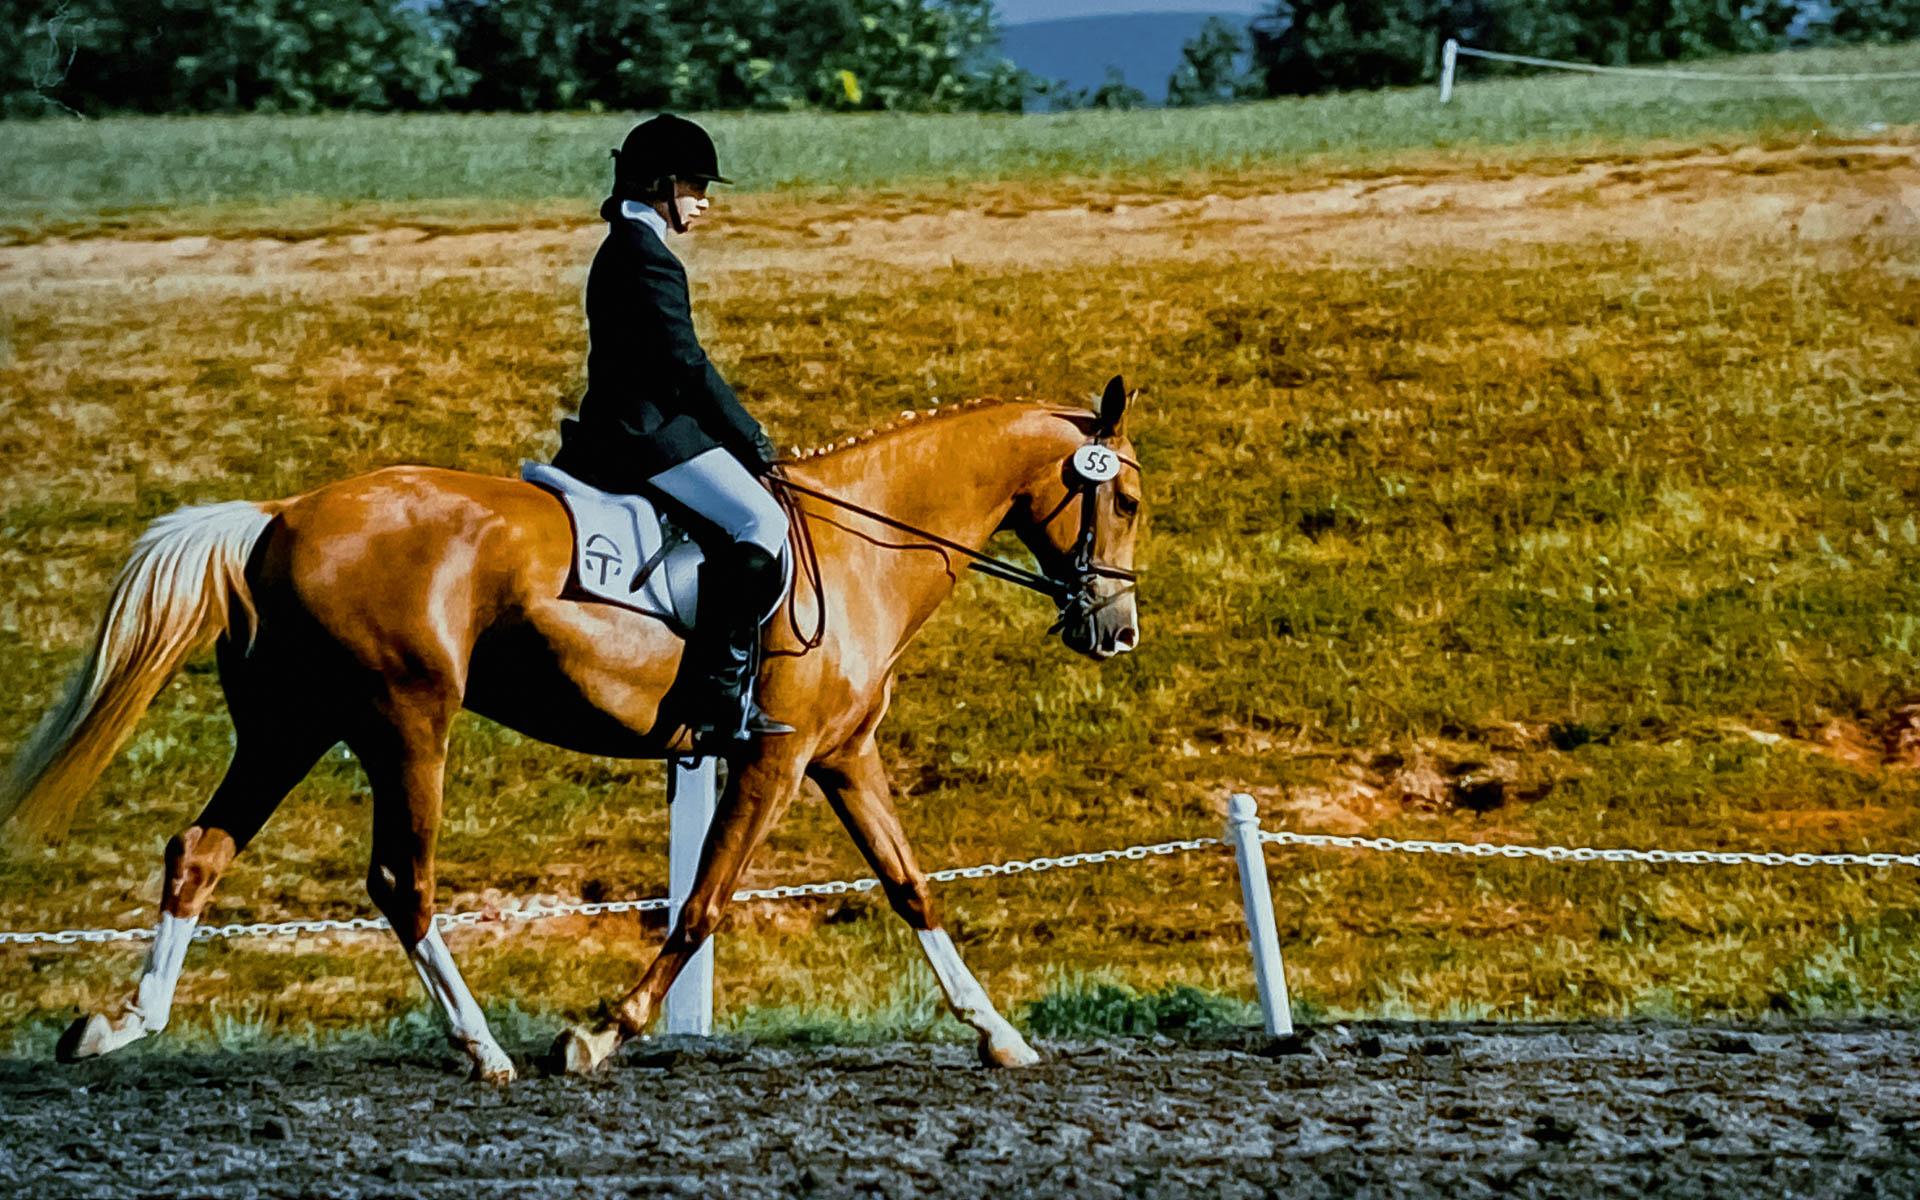 Dana Johnson riding her Akhal-Teke